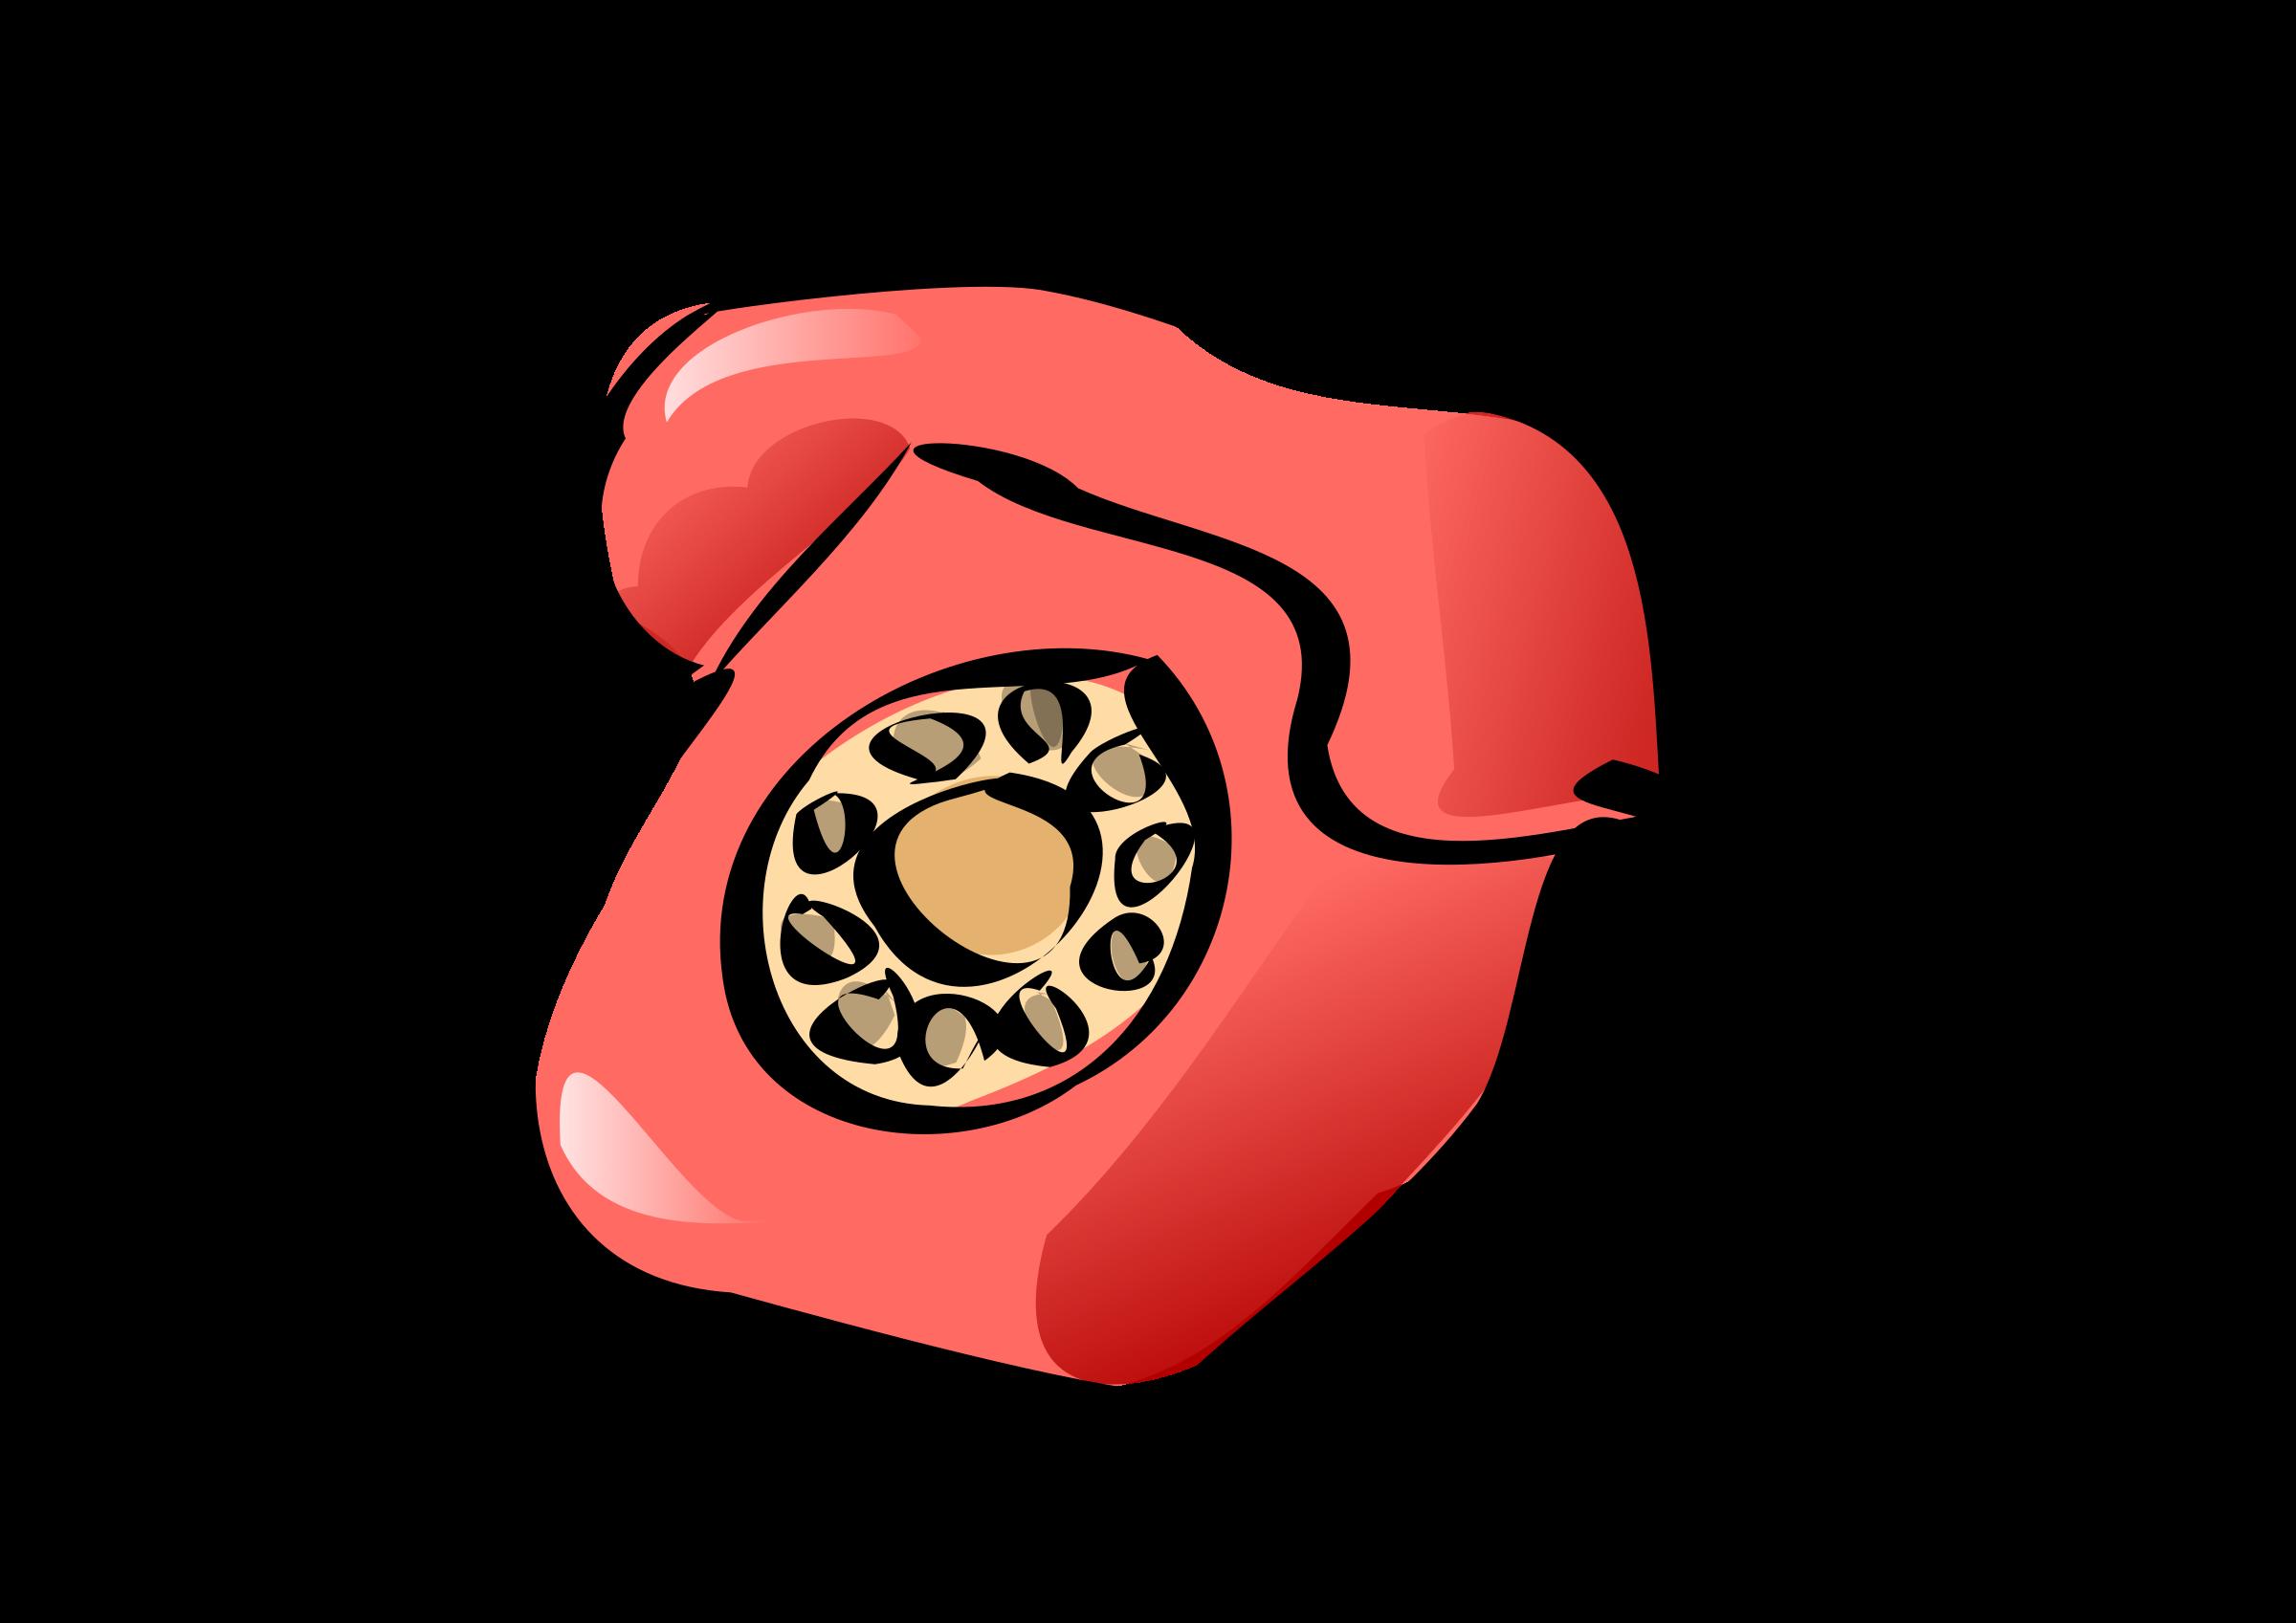 Telephone clipart telephony. Classic phone zazou big